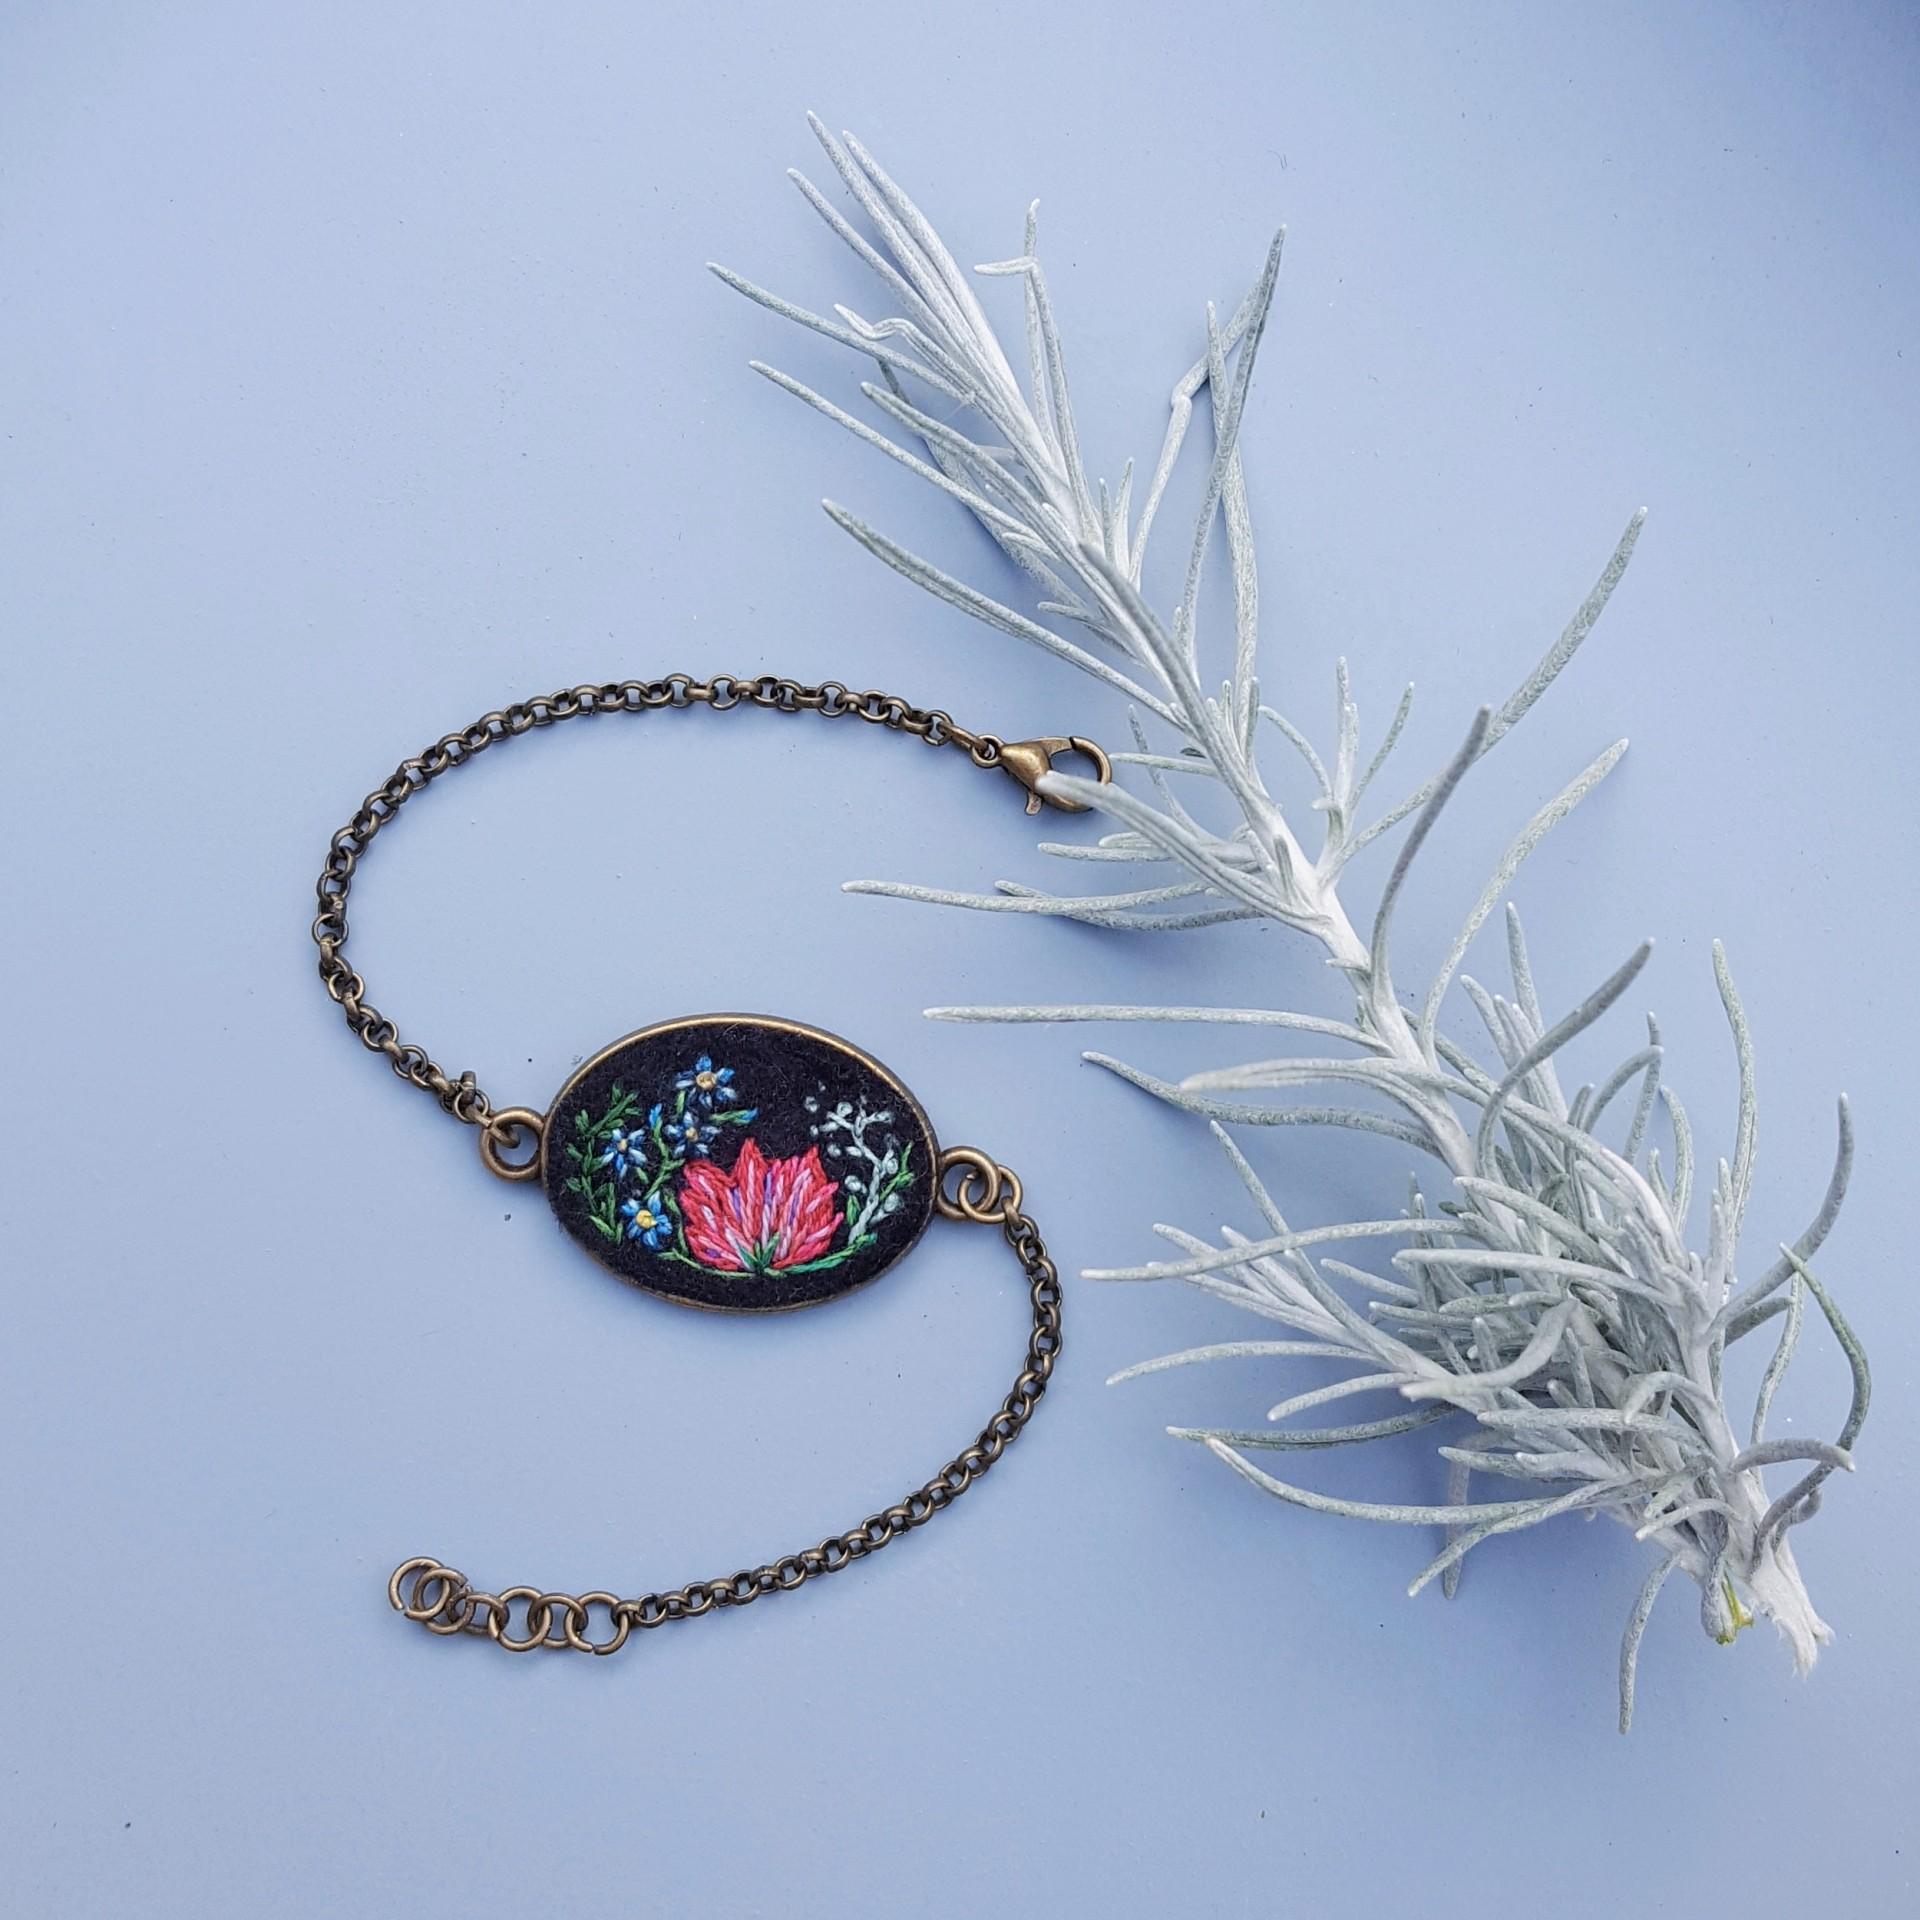 haftowana bransoletka serce łąki